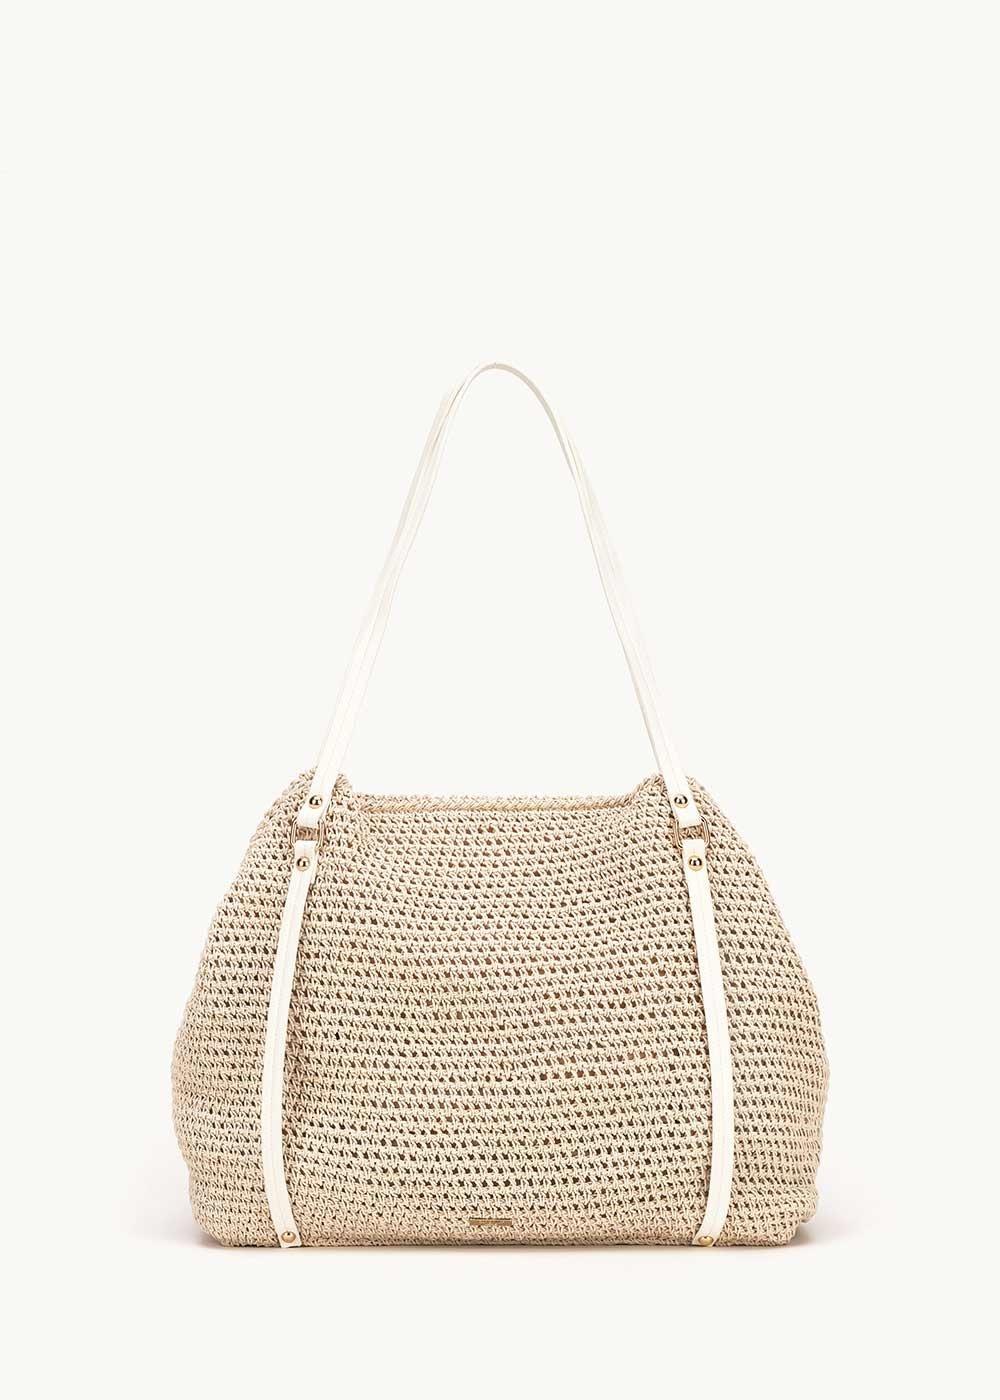 Shopping bag Bonita in paglia - Light Beige - Donna